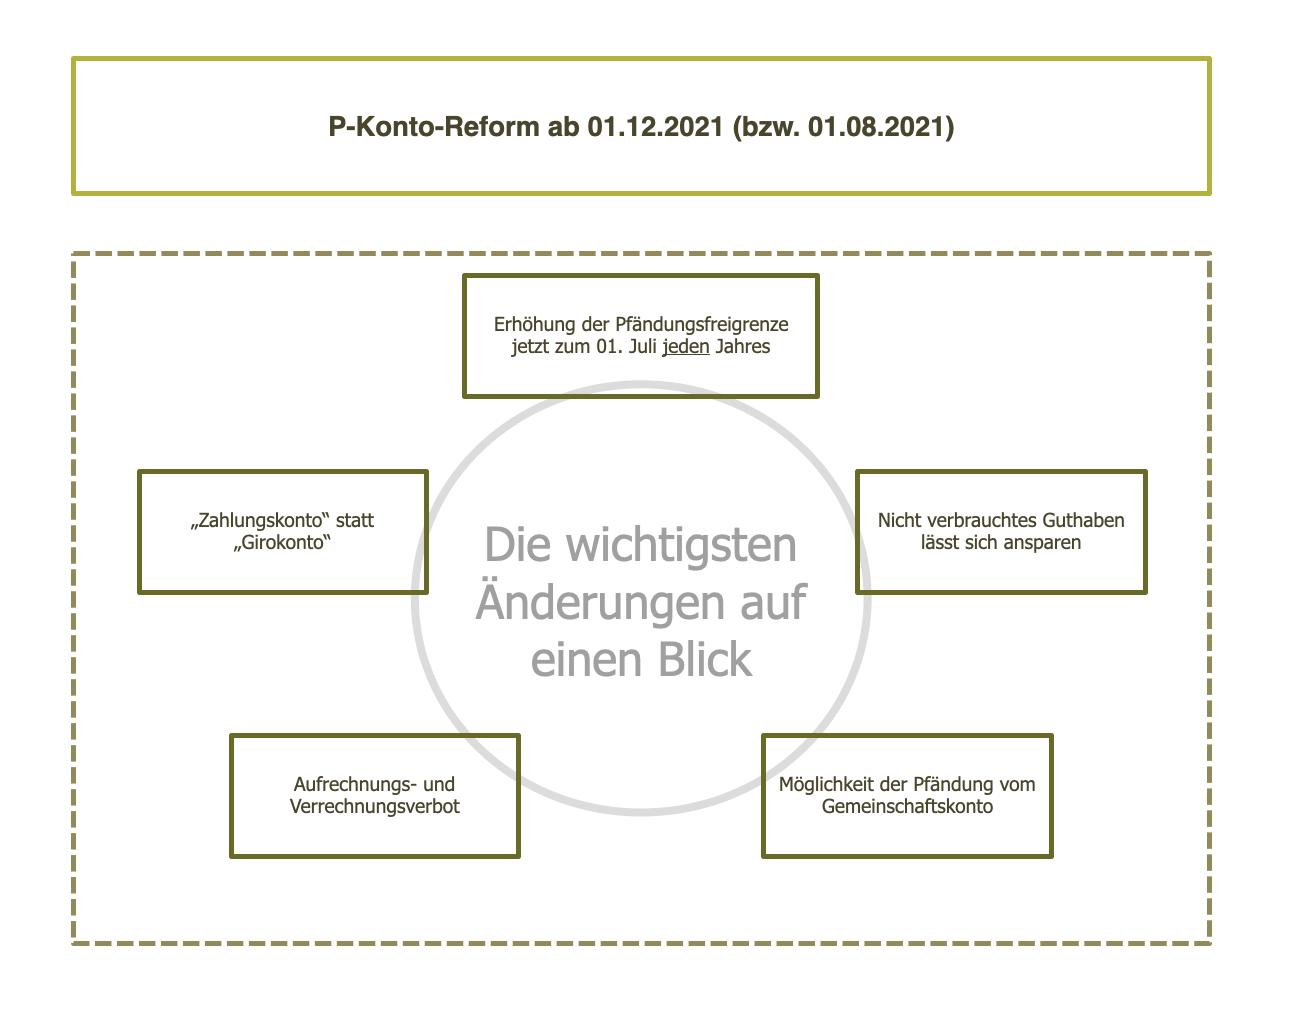 P-Konto-Reform 2021